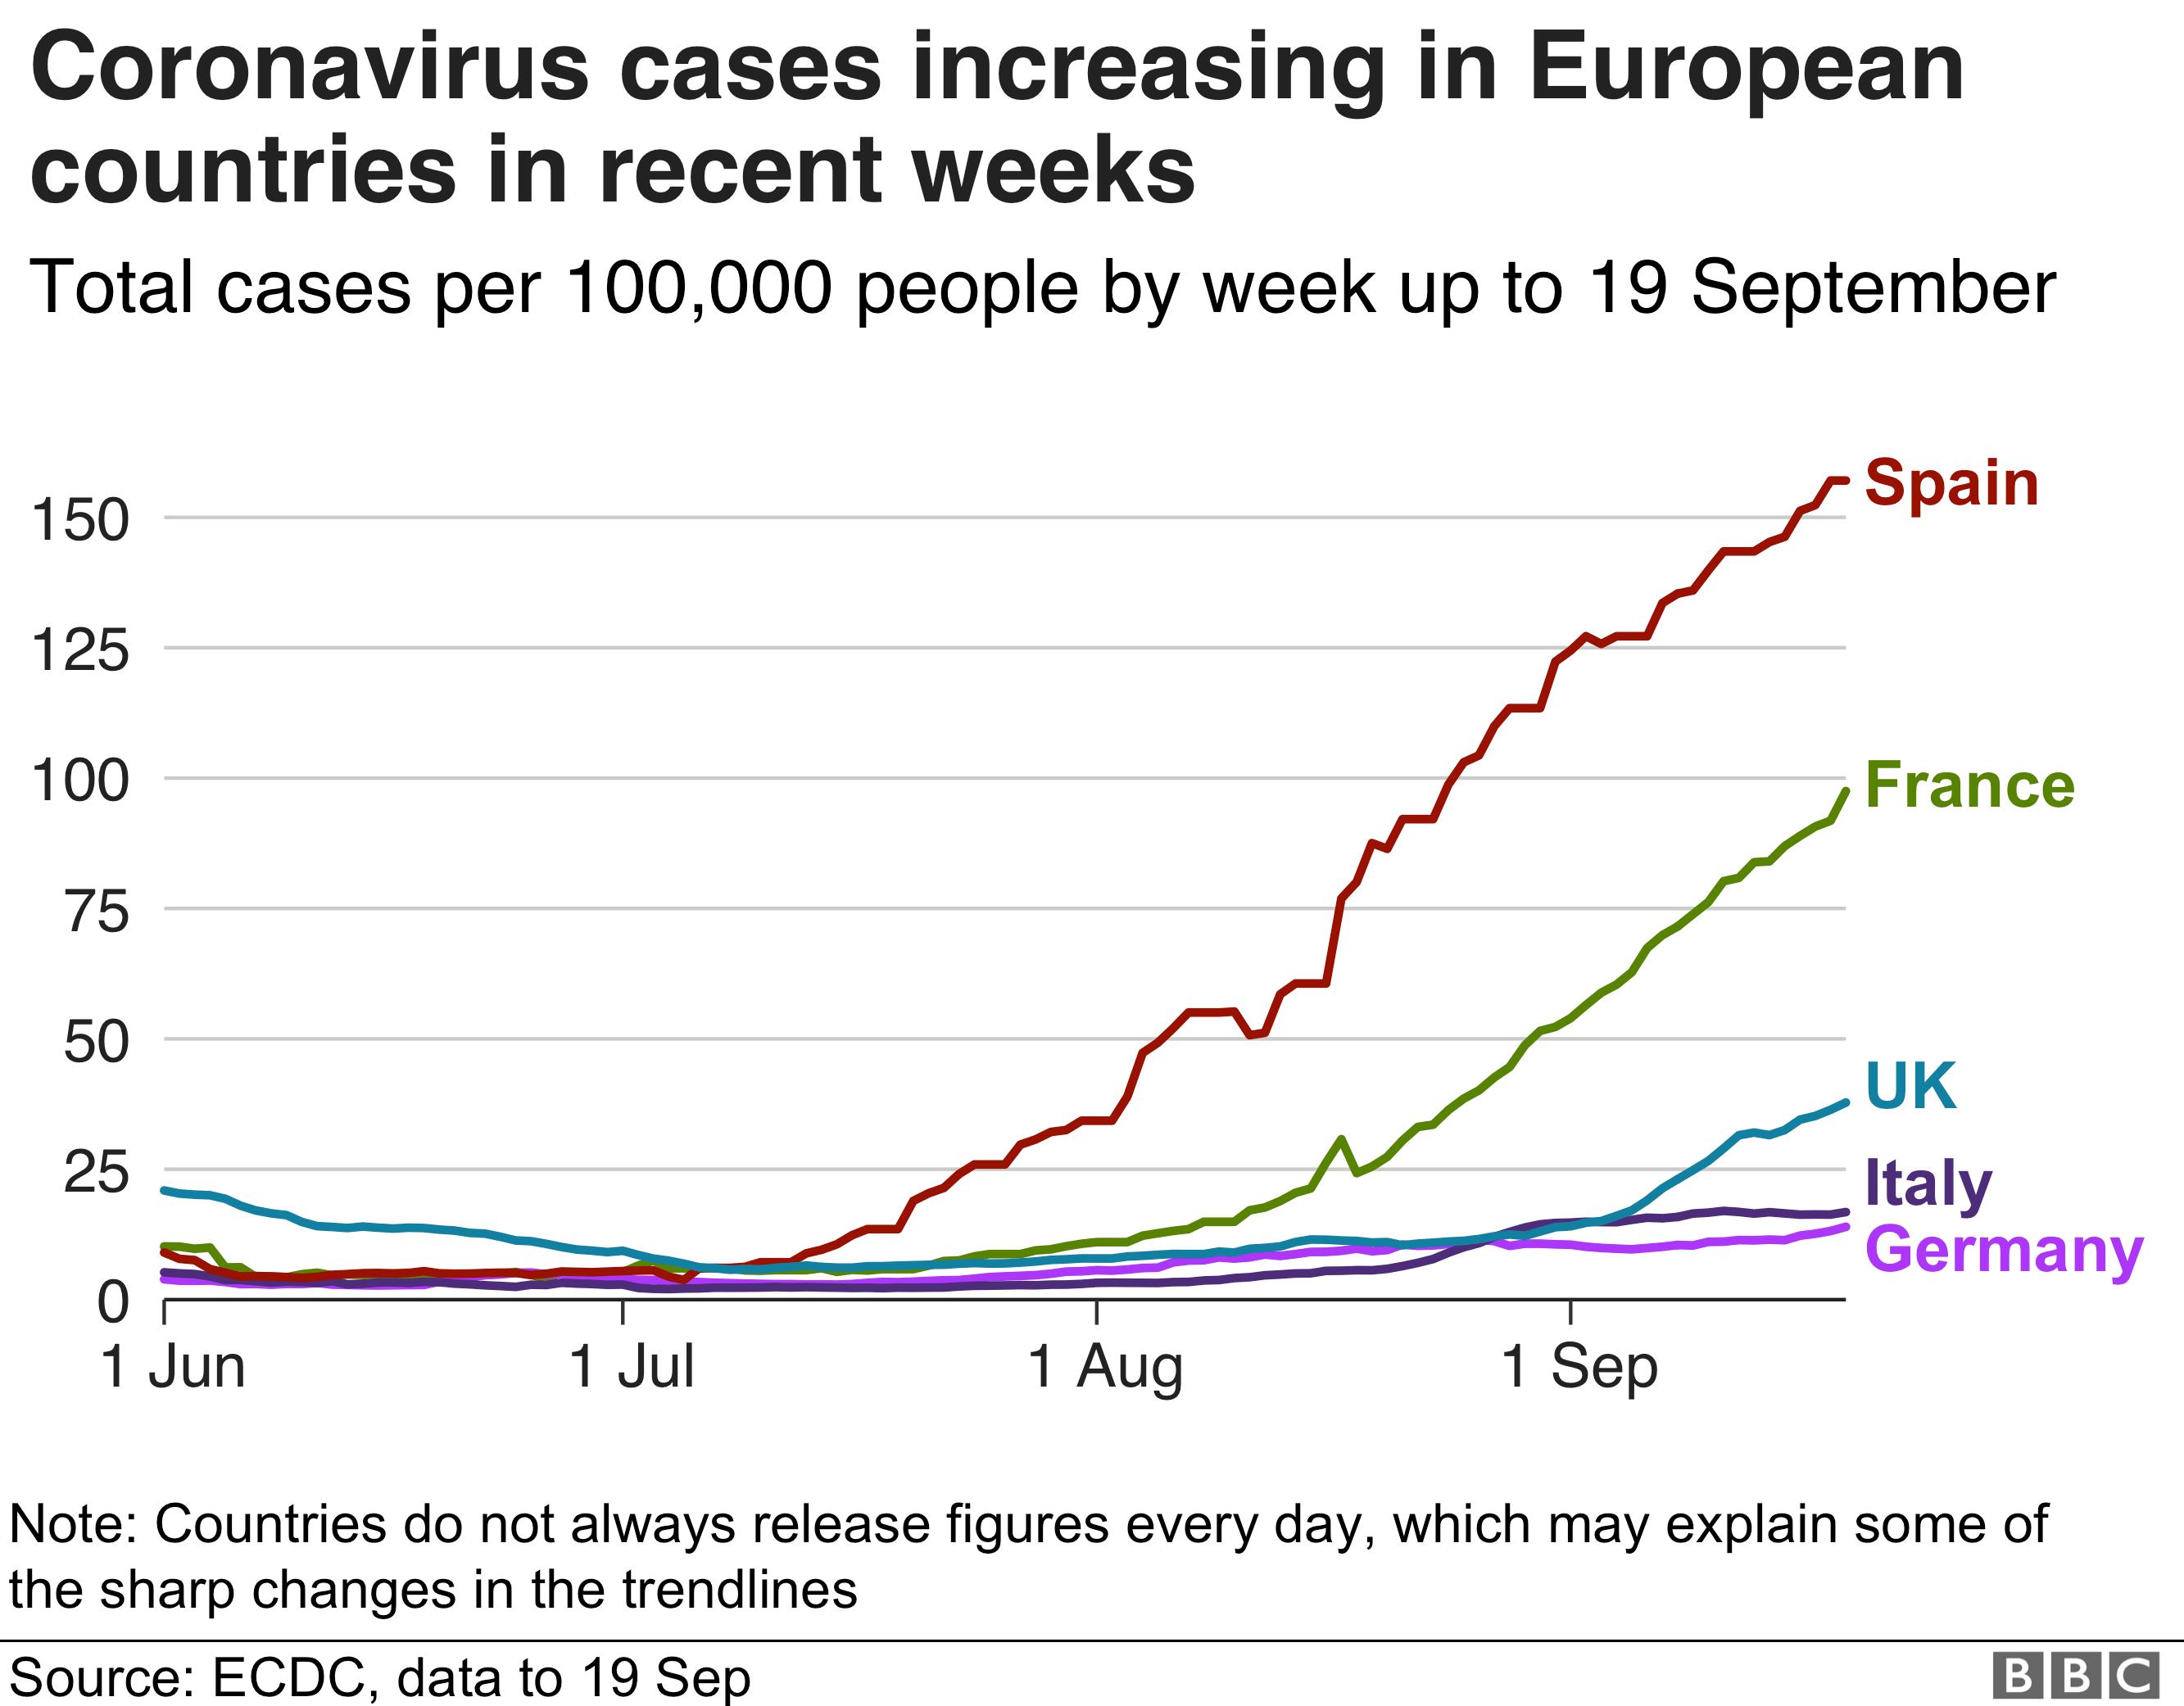 Chart showing coronavirus cases increasing in European countries in recent weeks. Updated 20 Sept.